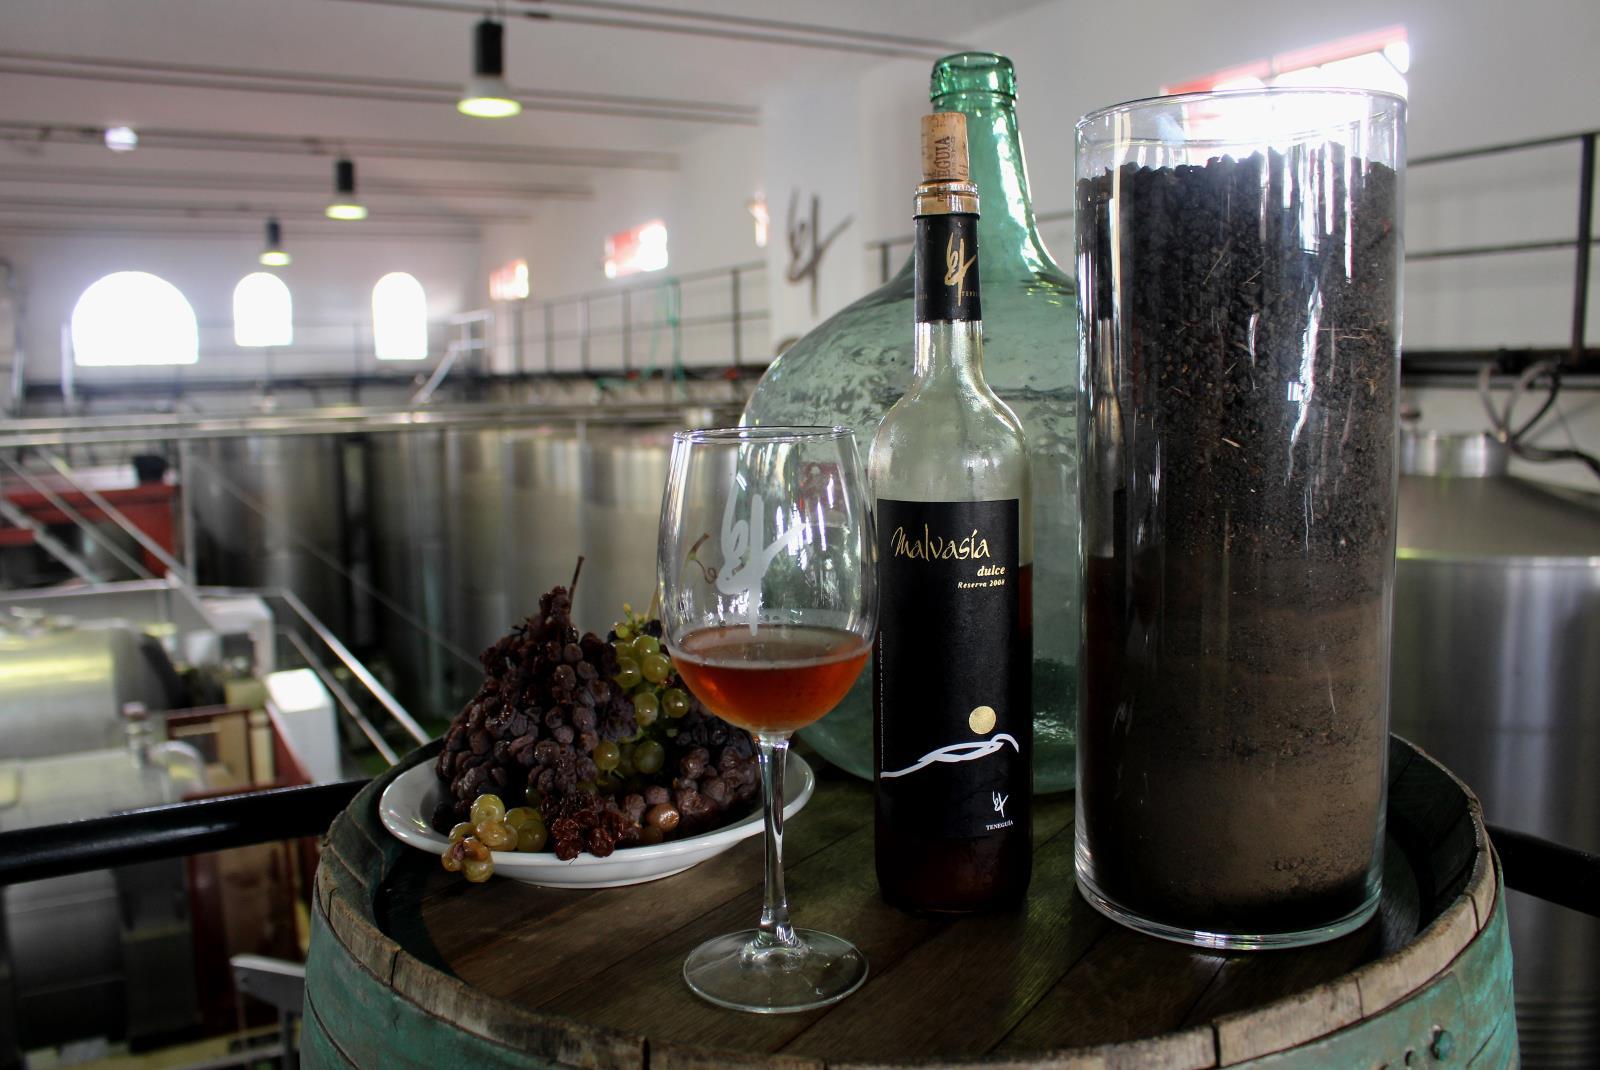 Visit-Bodegas-Teneguia-winery-with-wine-Tasting-8